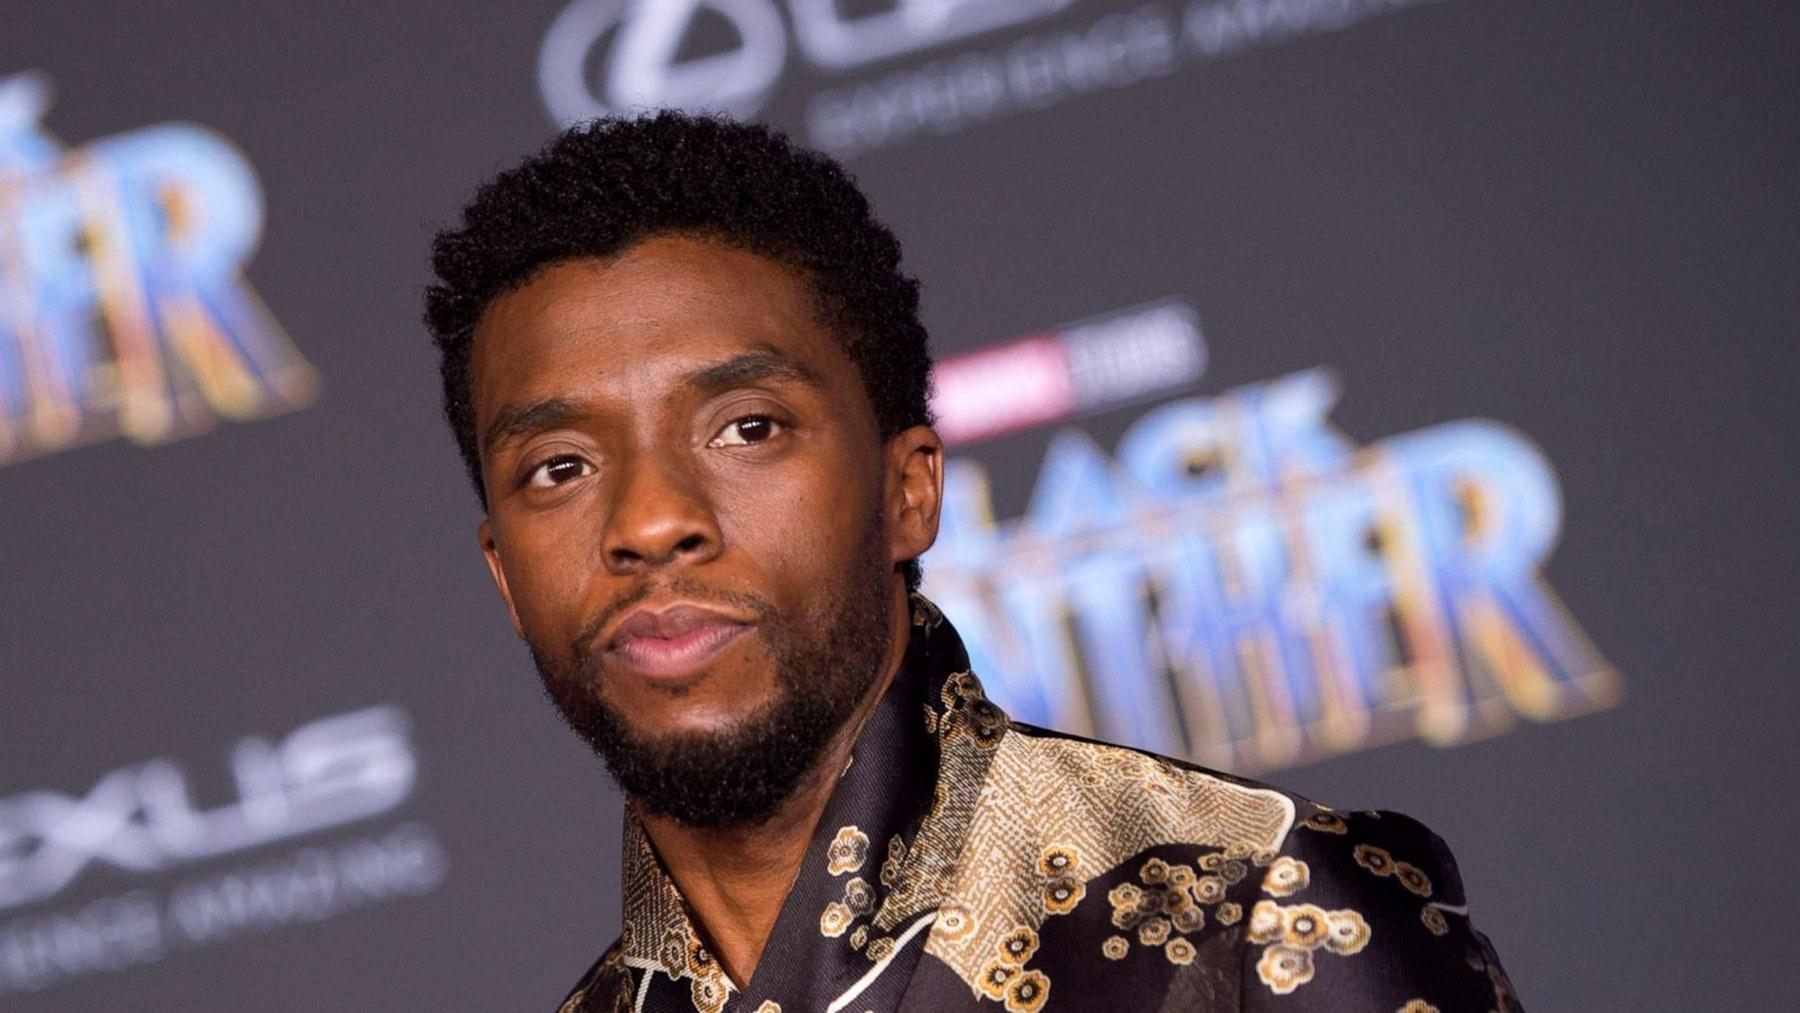 Chadwick Boseman Omari Hardwick 'Power' Actor